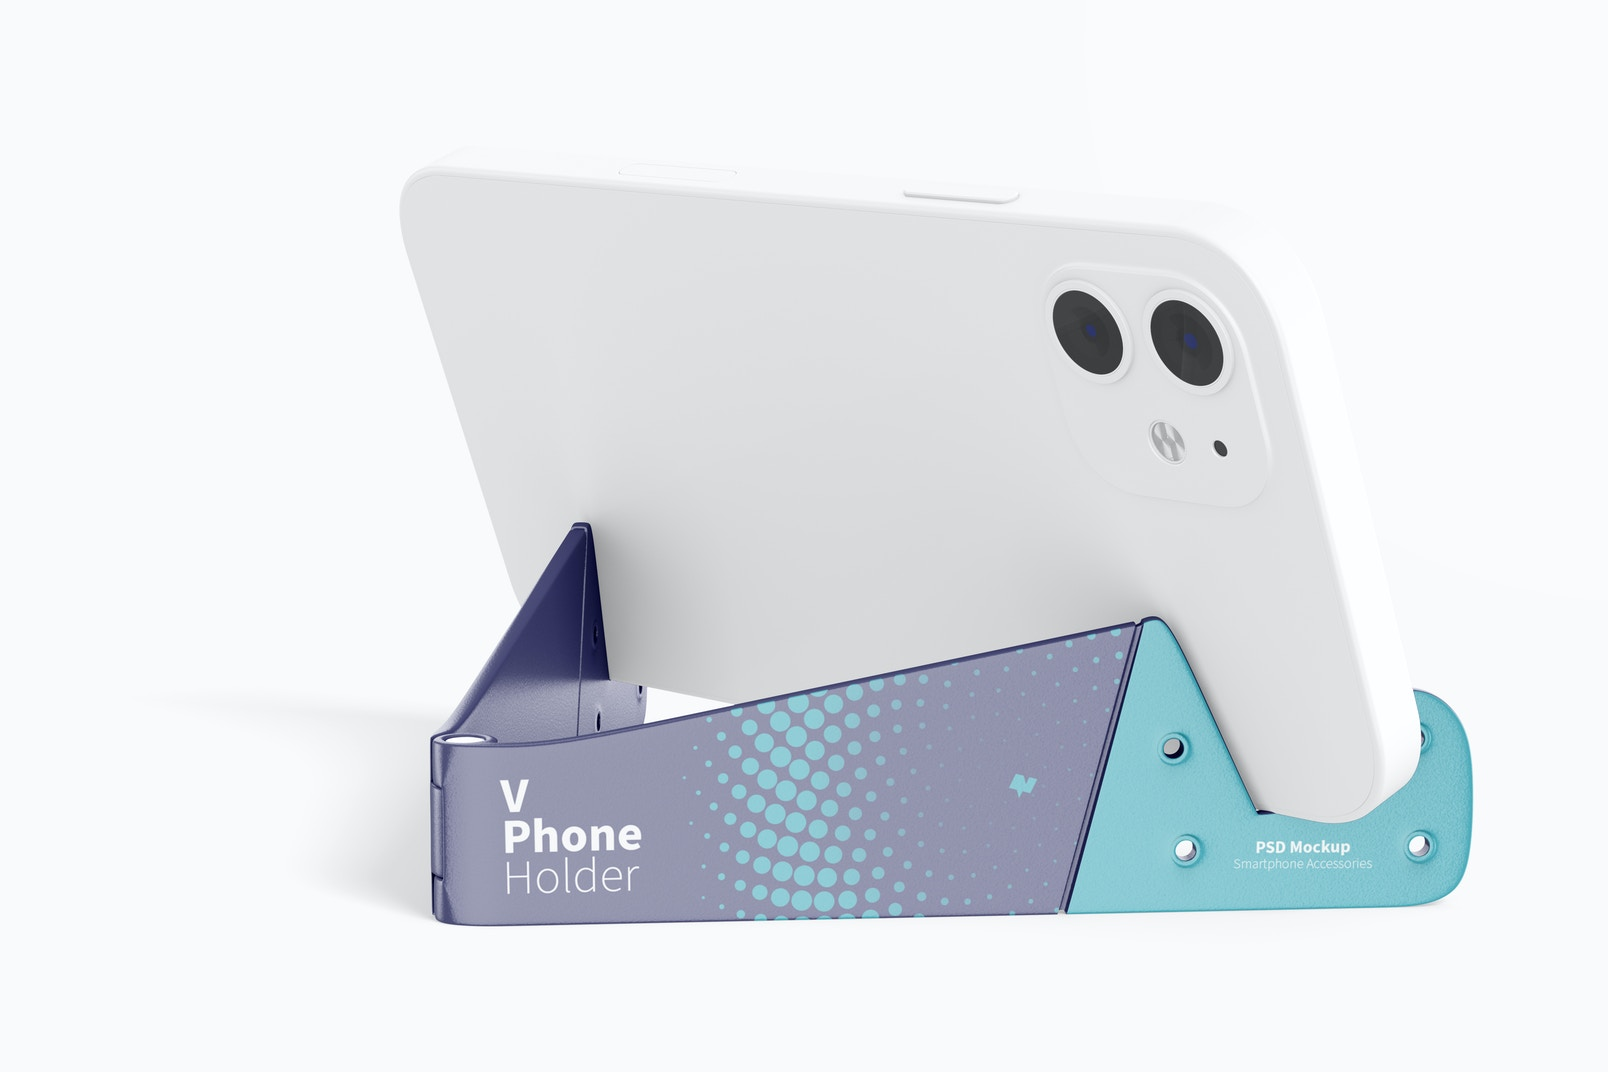 V Phone Holder with Device Mockup